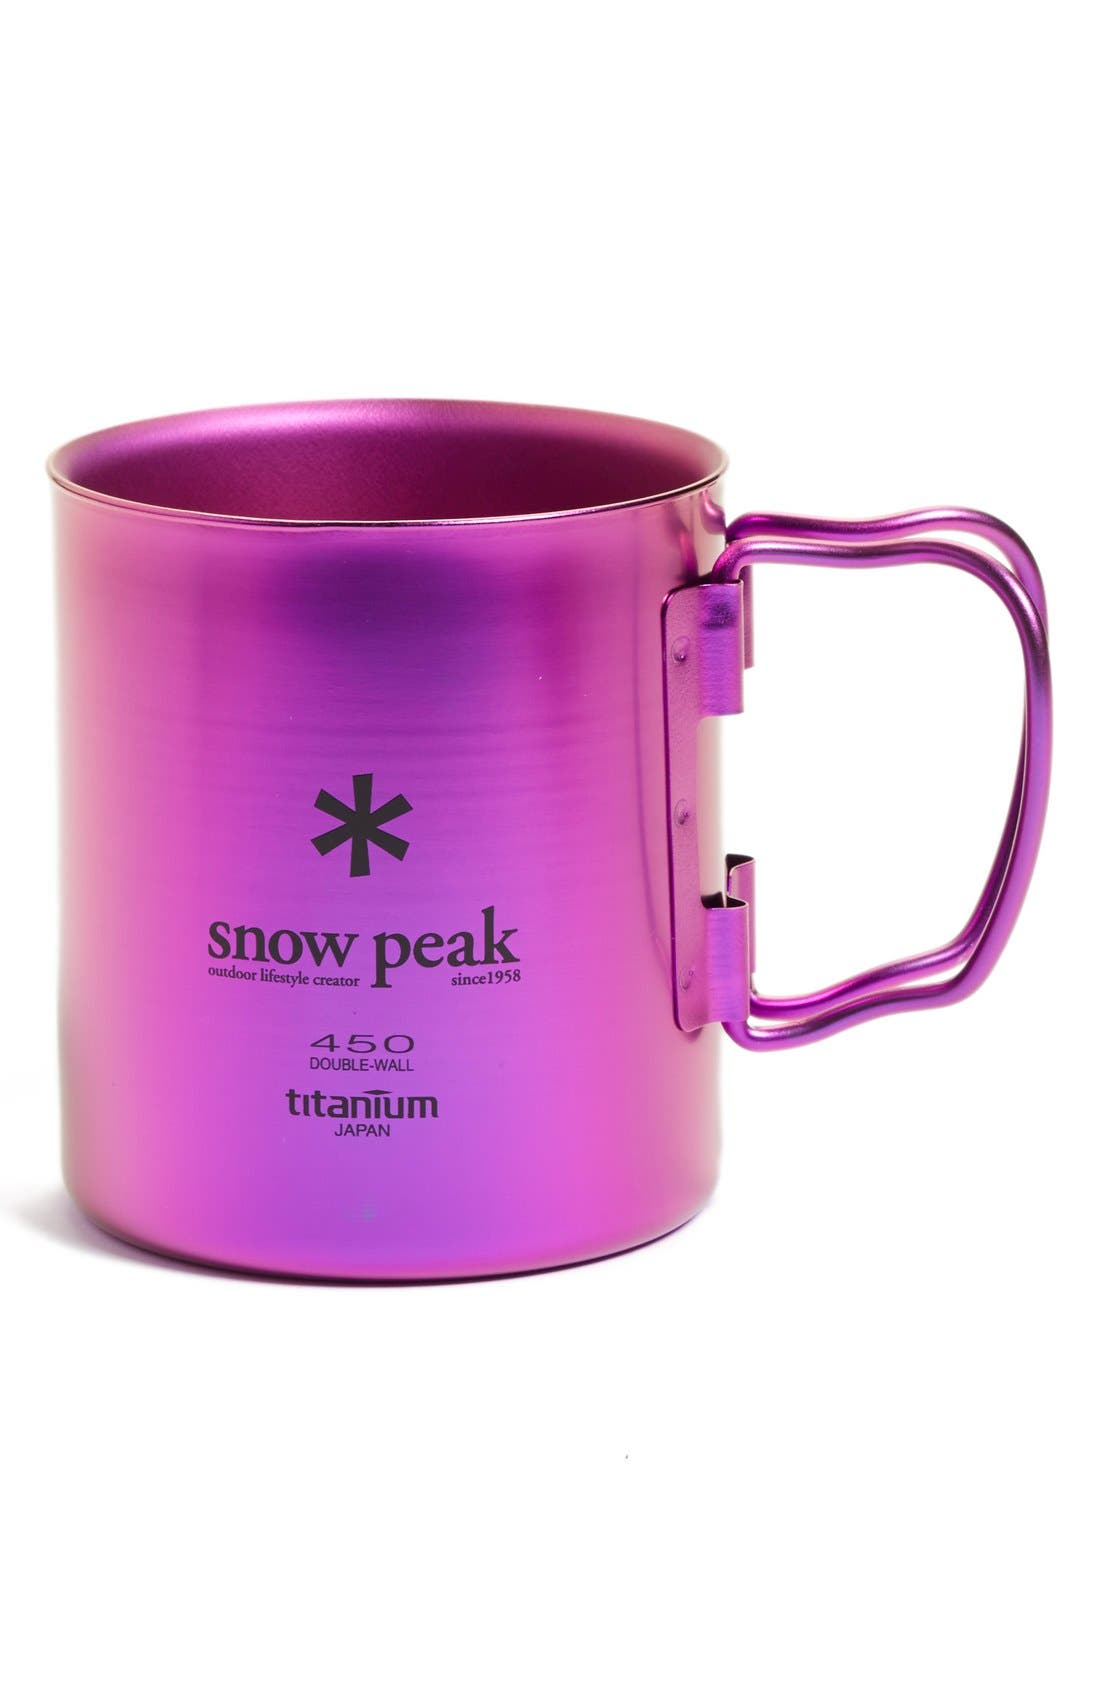 Alternate Image 1 Selected - Snow Peak 'Ti-Double 450' Insulated Titanium Camping Mug